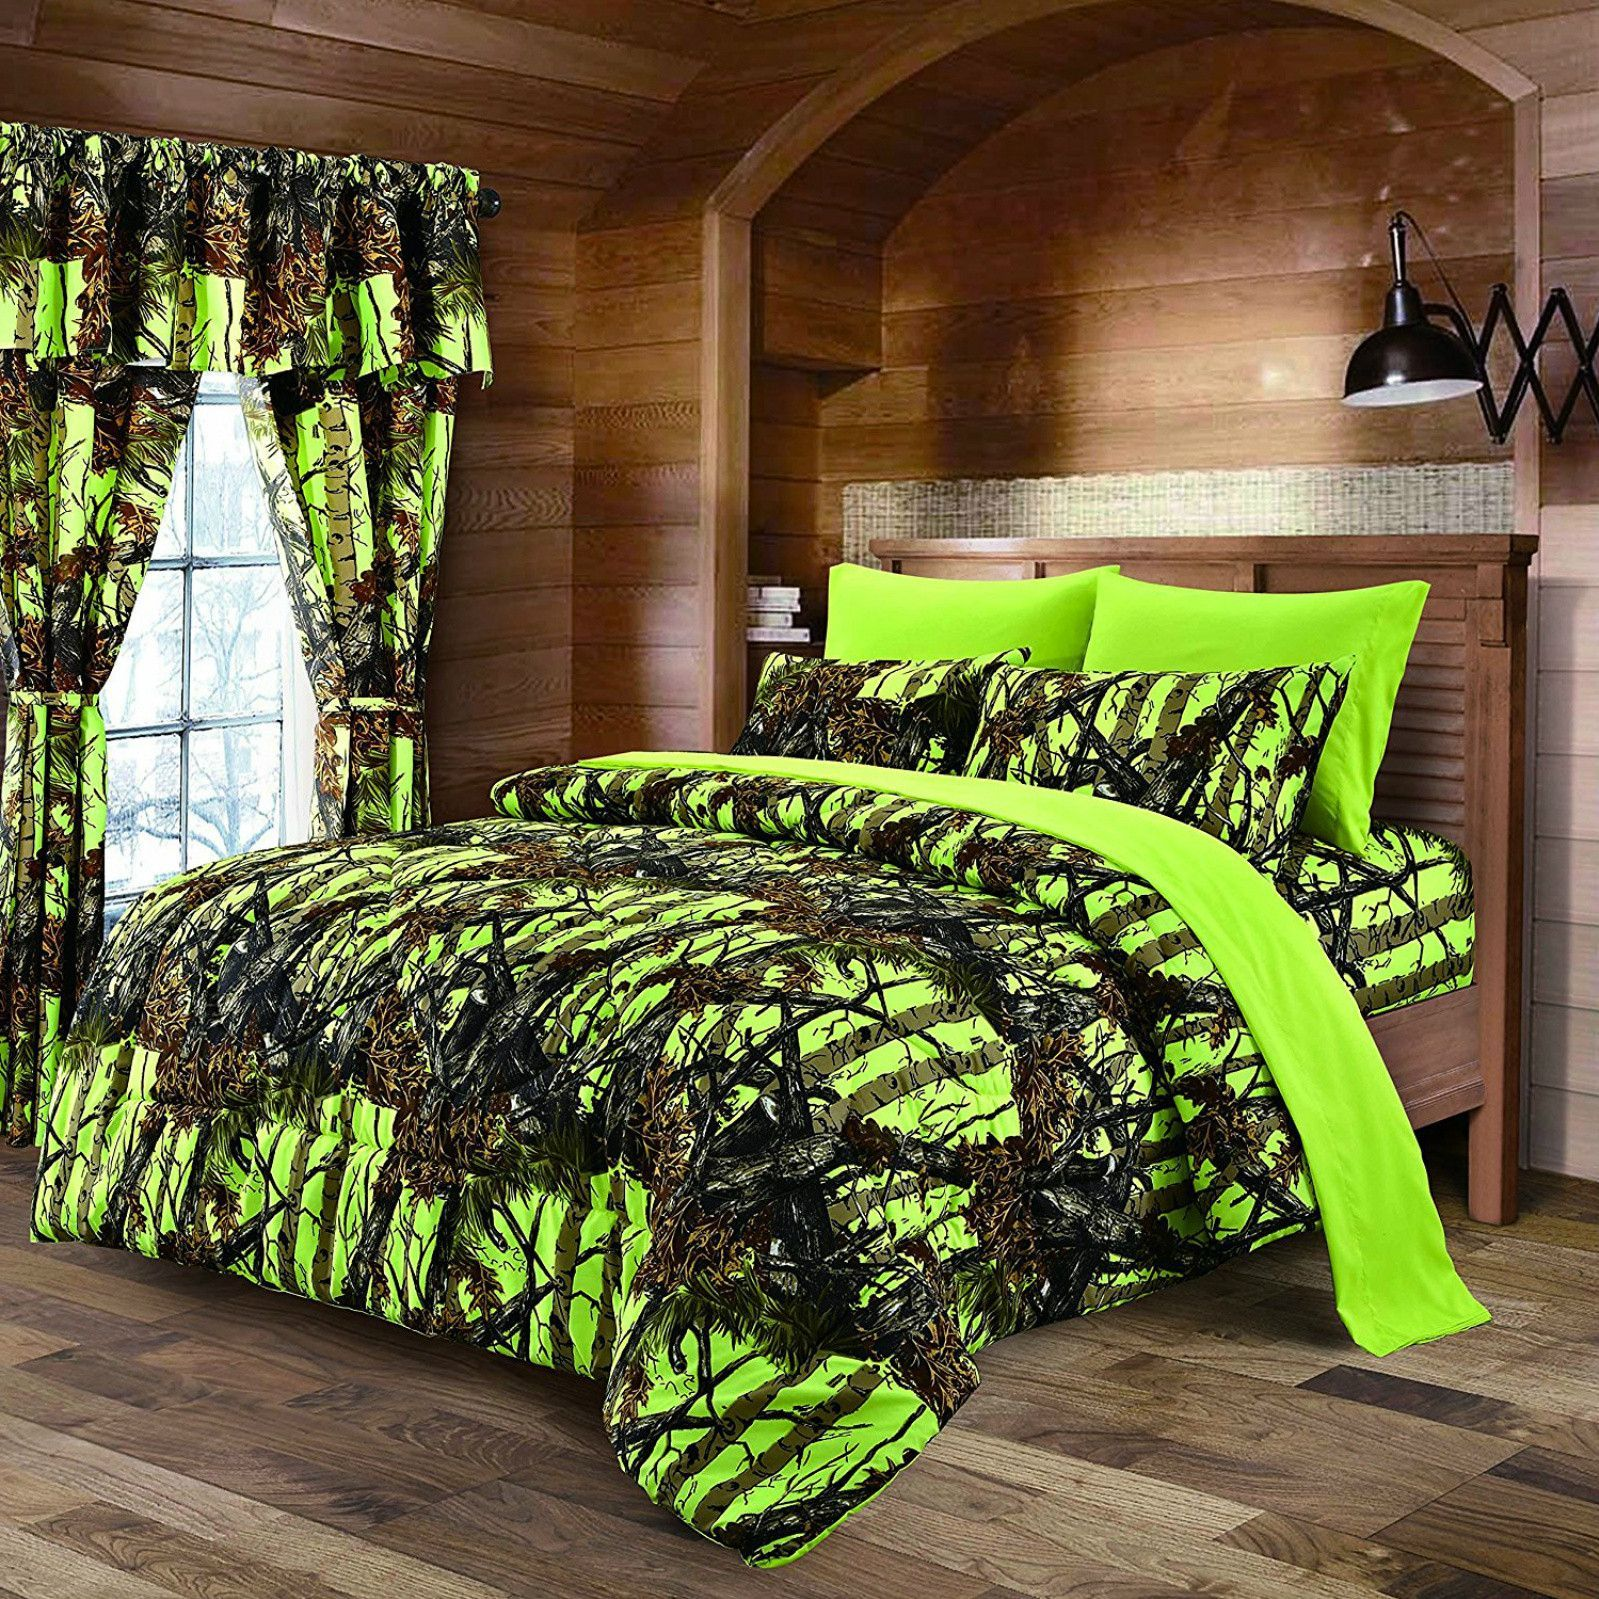 Kids Camo Bedding Boys Comforter Sets Girls Sheets Adults